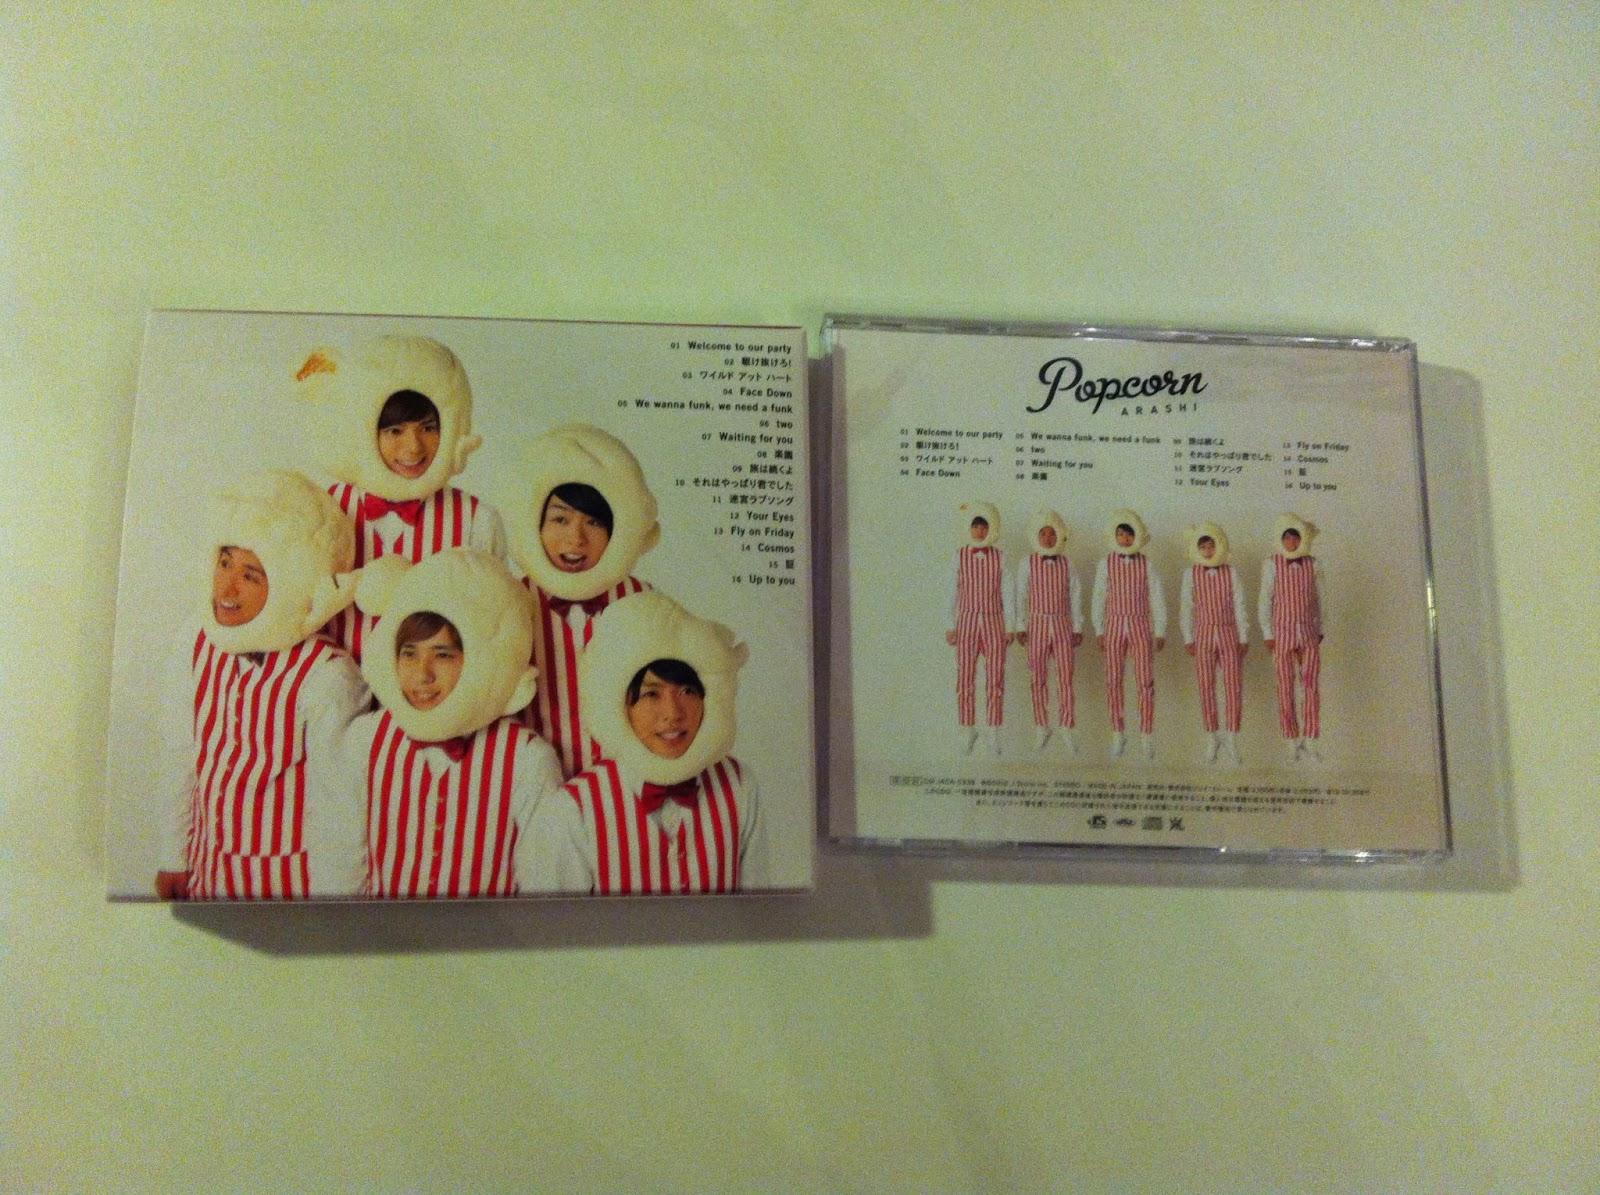 Arashi Concert Dvd-cover Related Keywords & Suggestions - Arashi